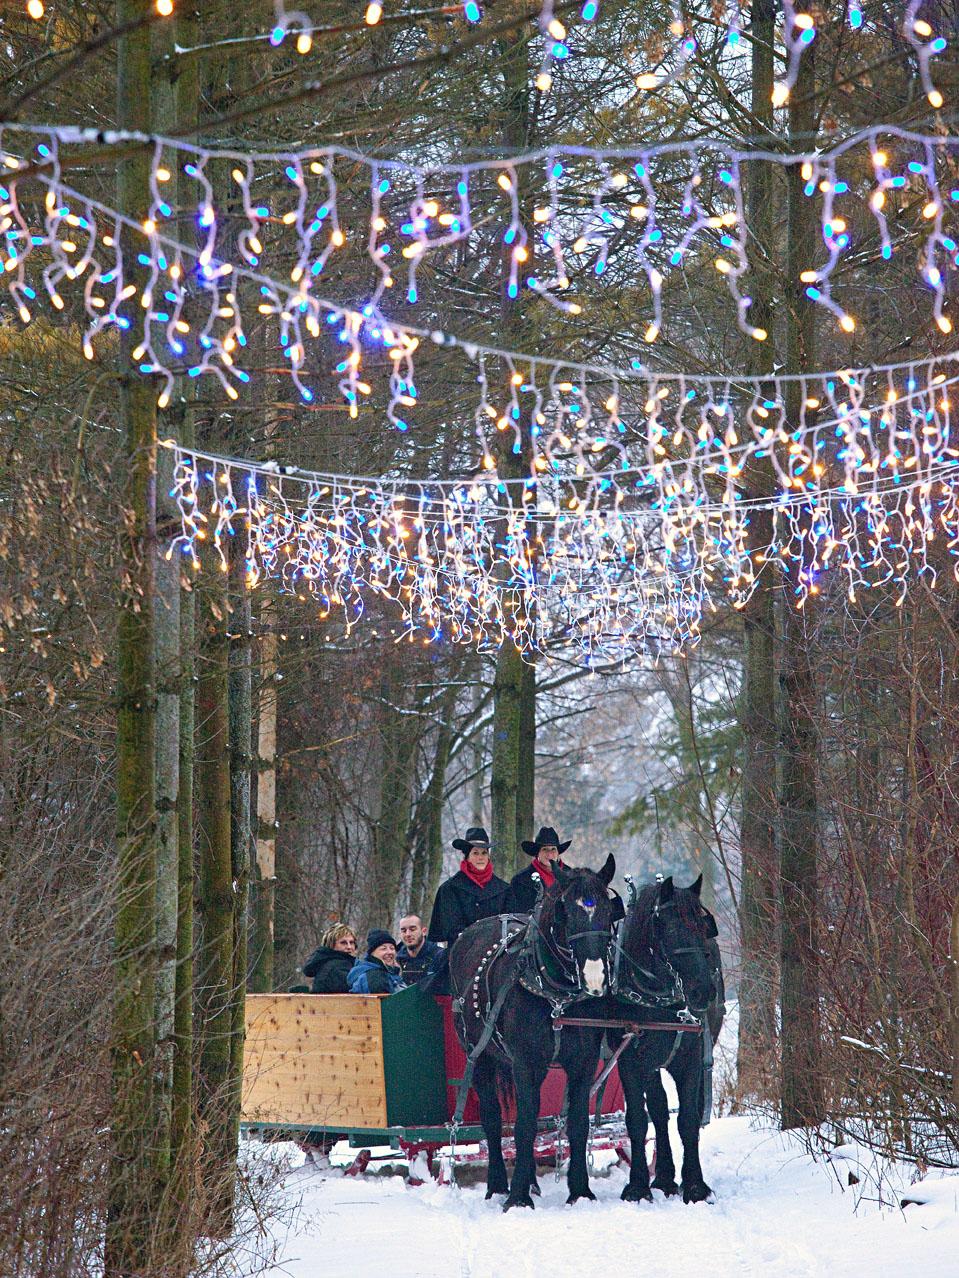 Dusk makes sleigh rides at Paradise Ranch near Cedarburg, Wisconsin, enchanting.